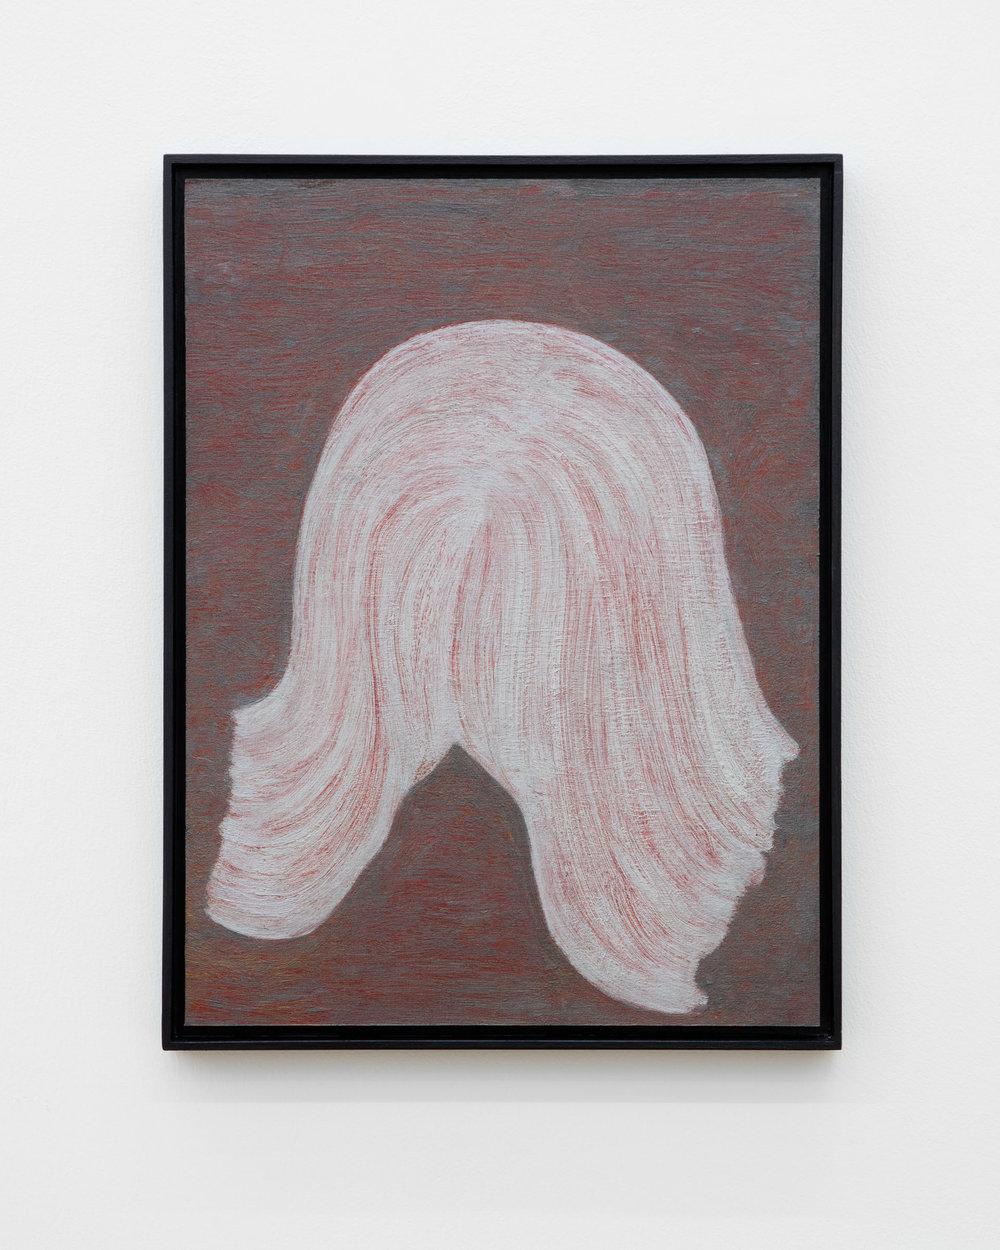 Veronika Hilger: Untitled, 2019, oil on paper on MDF in artists frame, 39,7 x 29,7 cm